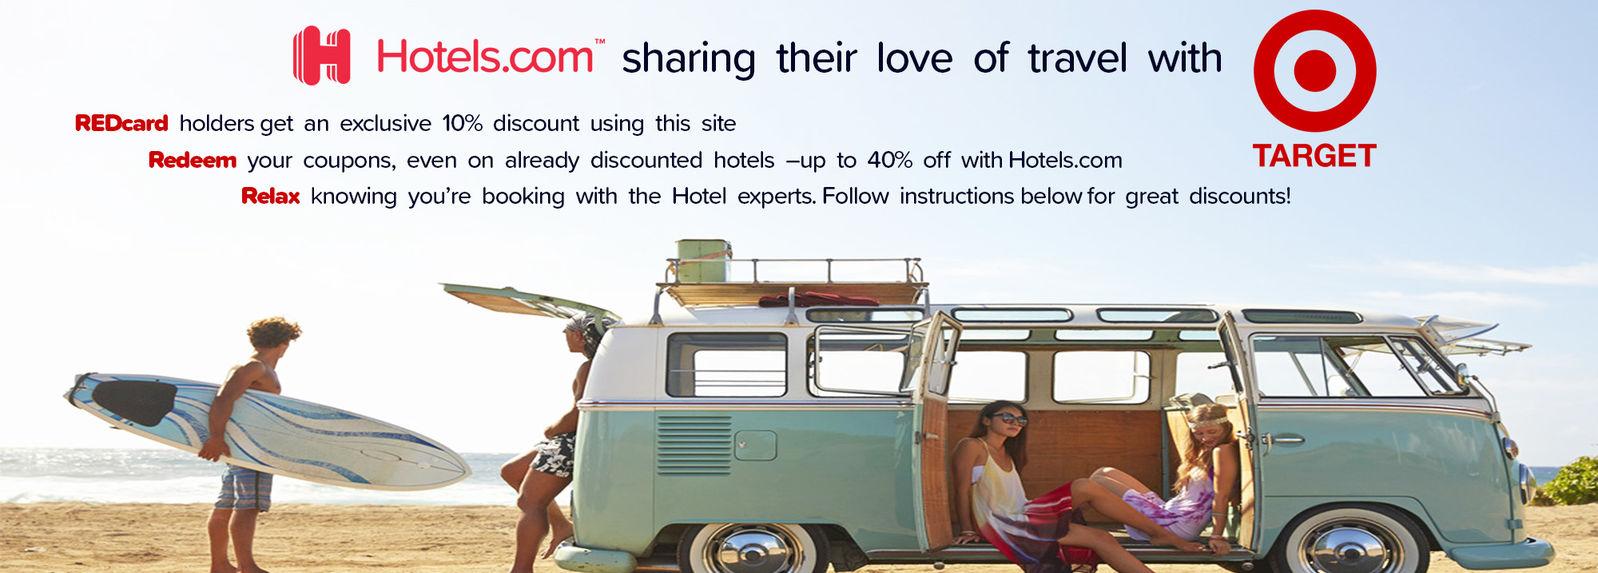 Hotels.com | Target